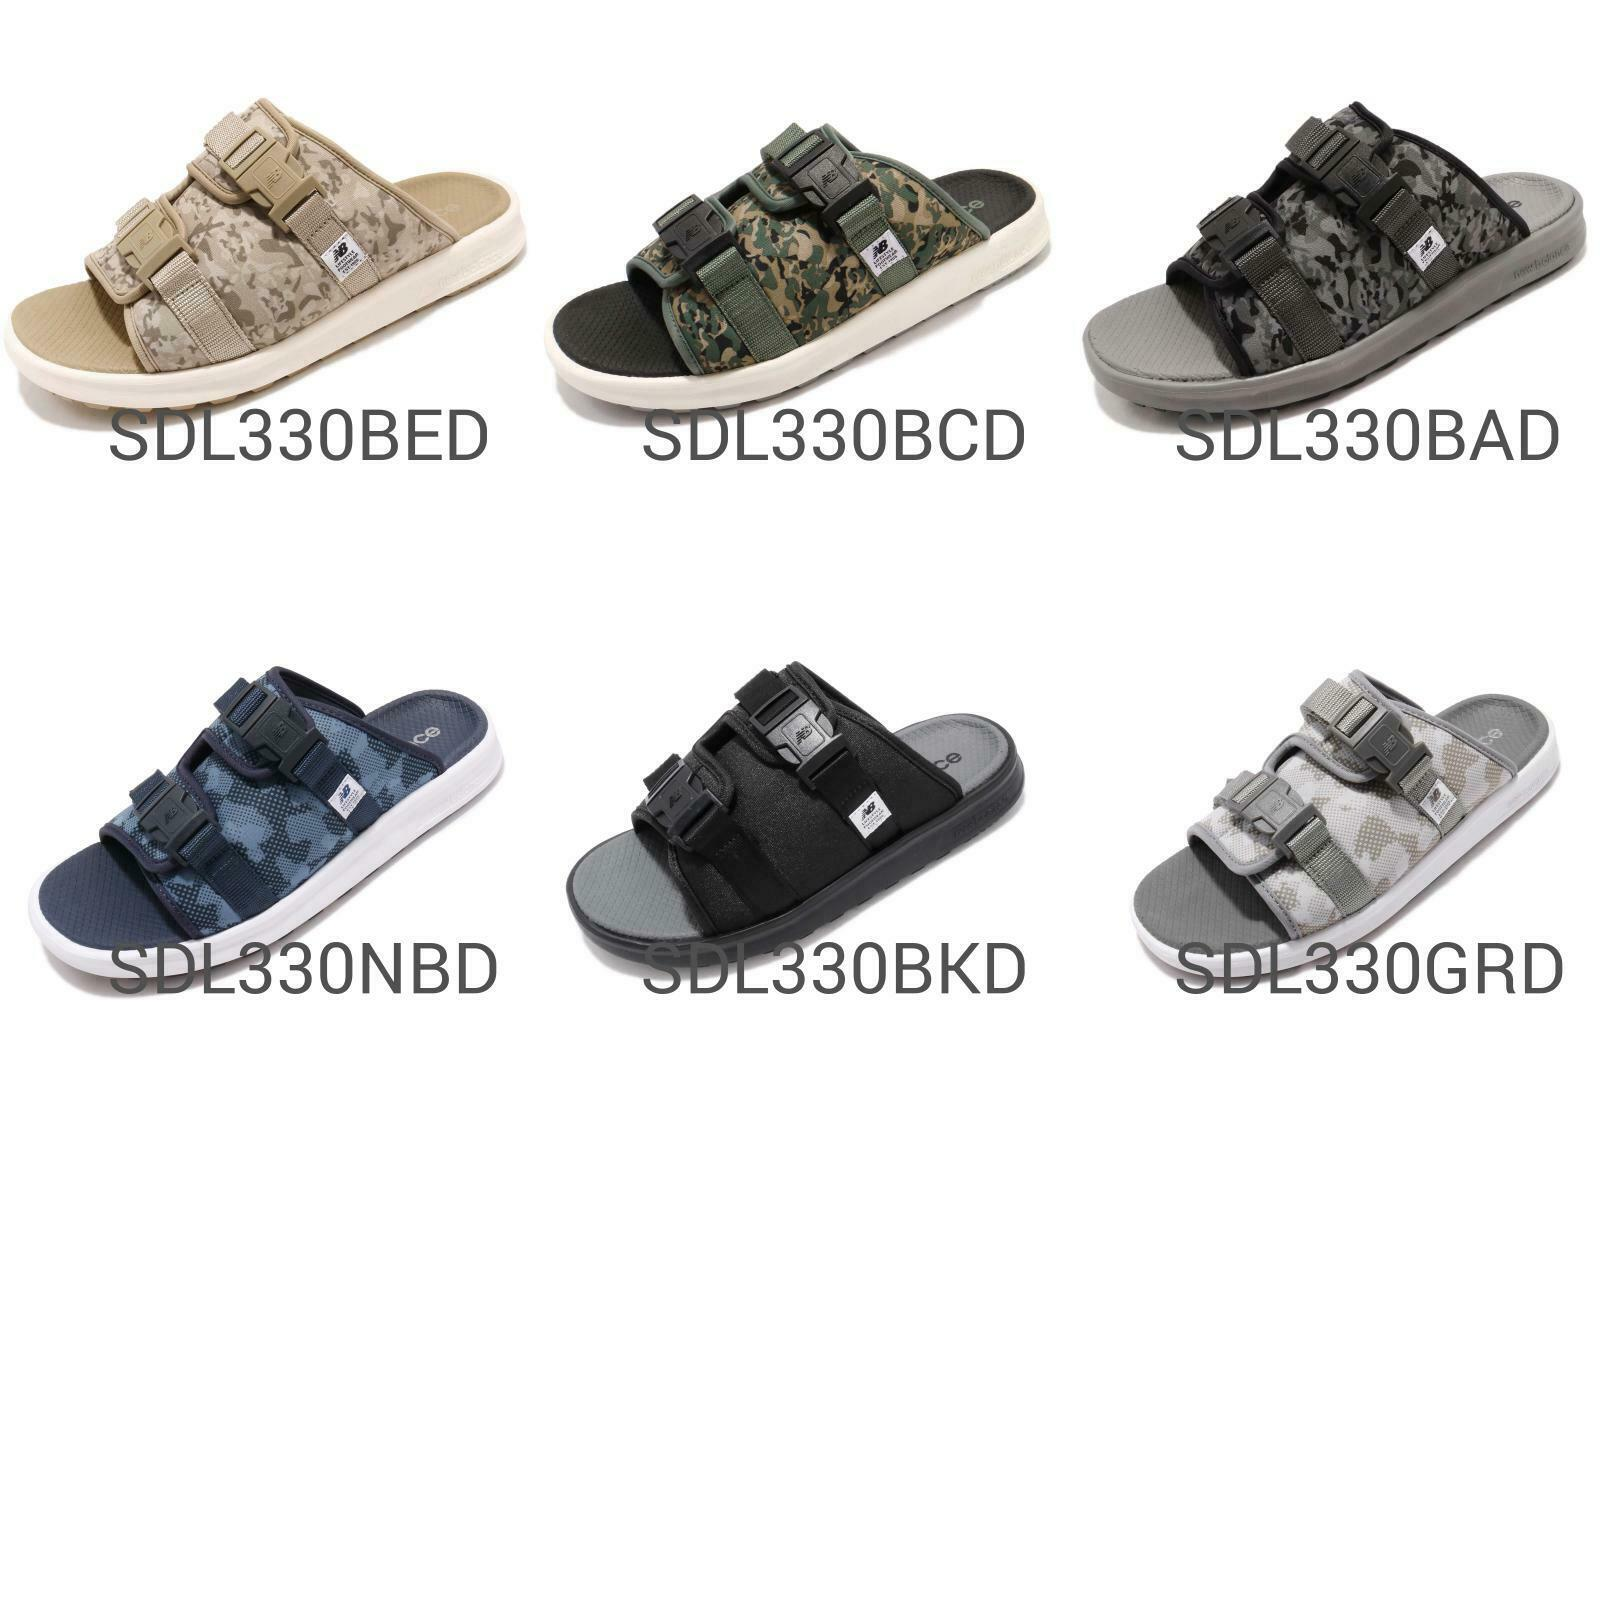 New Balance SDL330 330 D Men mujer Sports Sandals Slides Slippers Pick 1